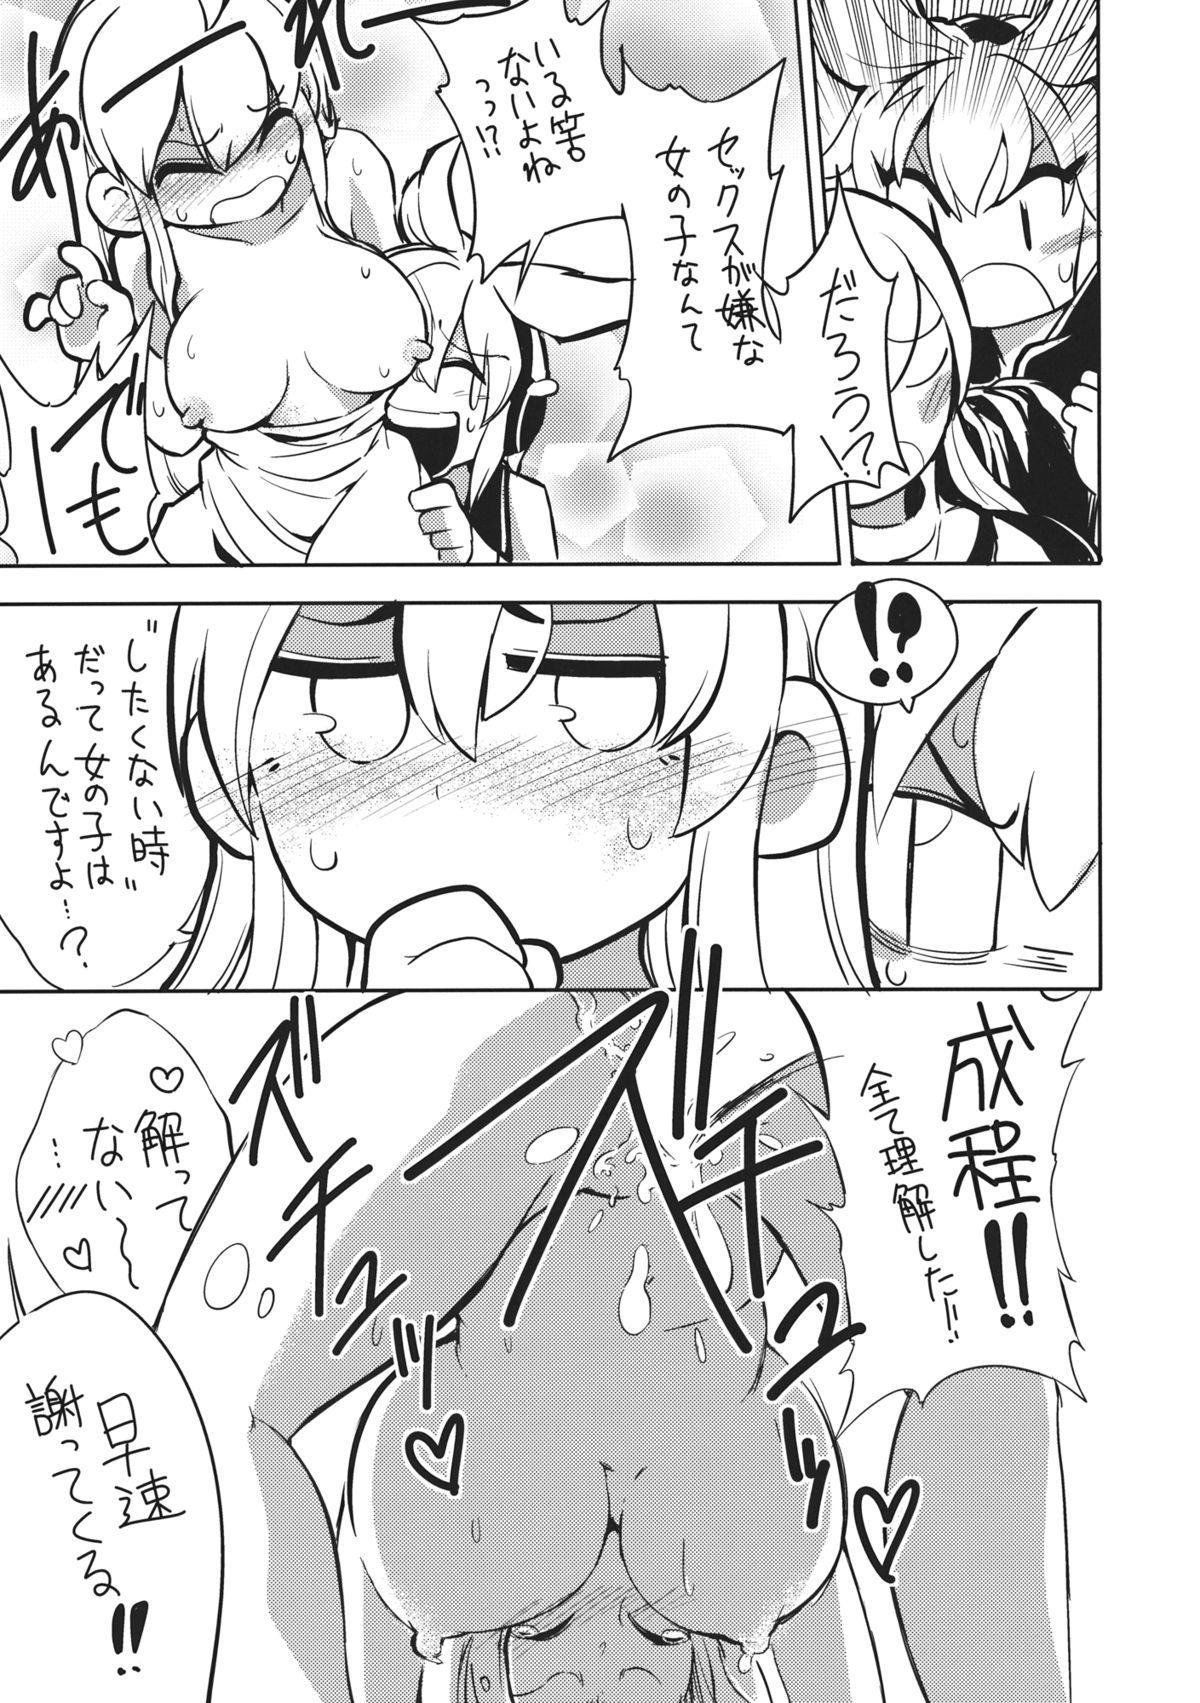 Tojiko to Sex 7